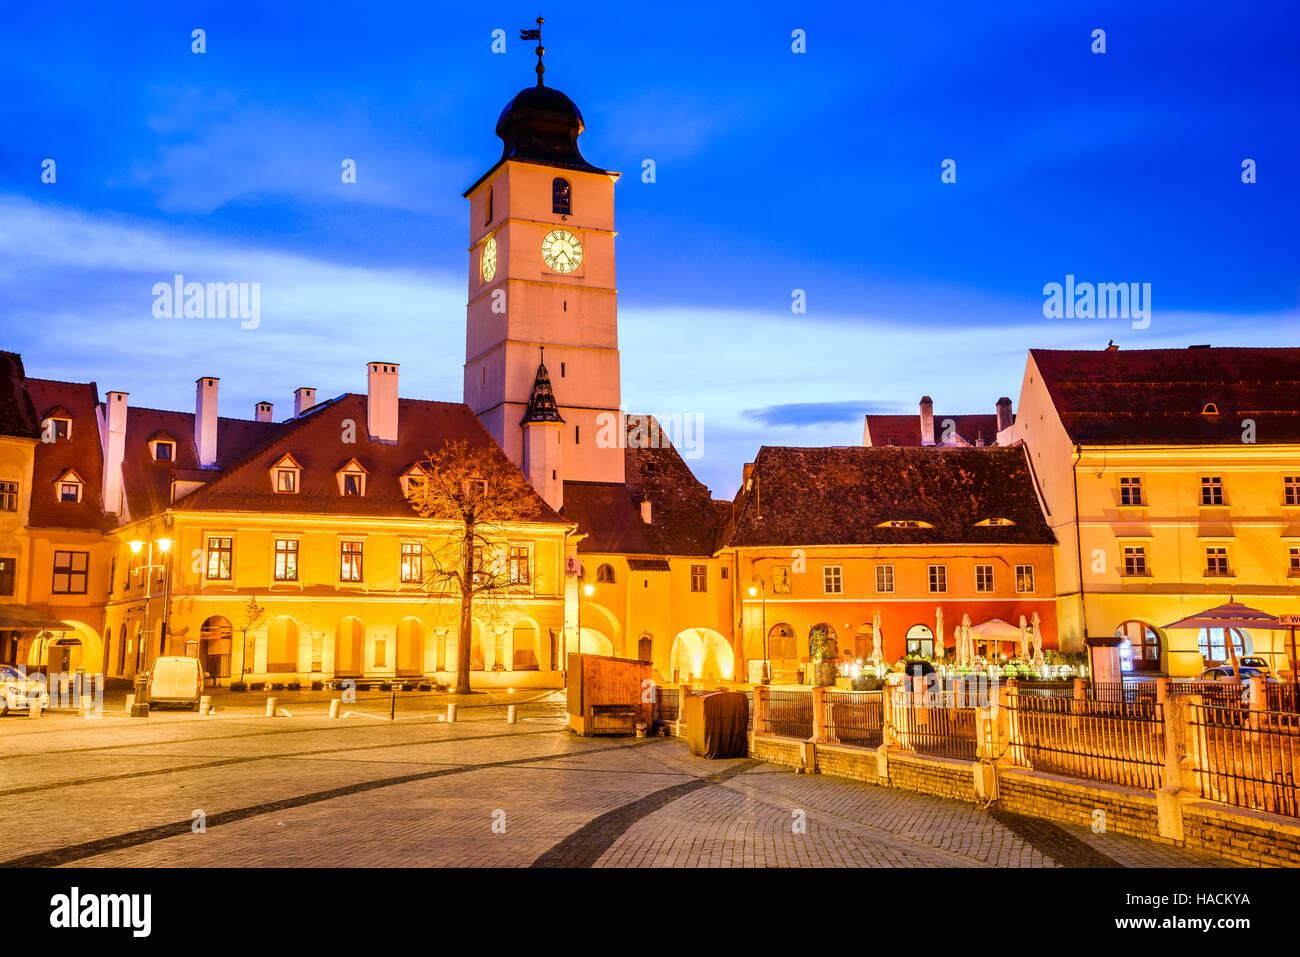 Sibiu, Romania. Twilight image of Council Tower in Small Square, Transylvania. Stock Photo